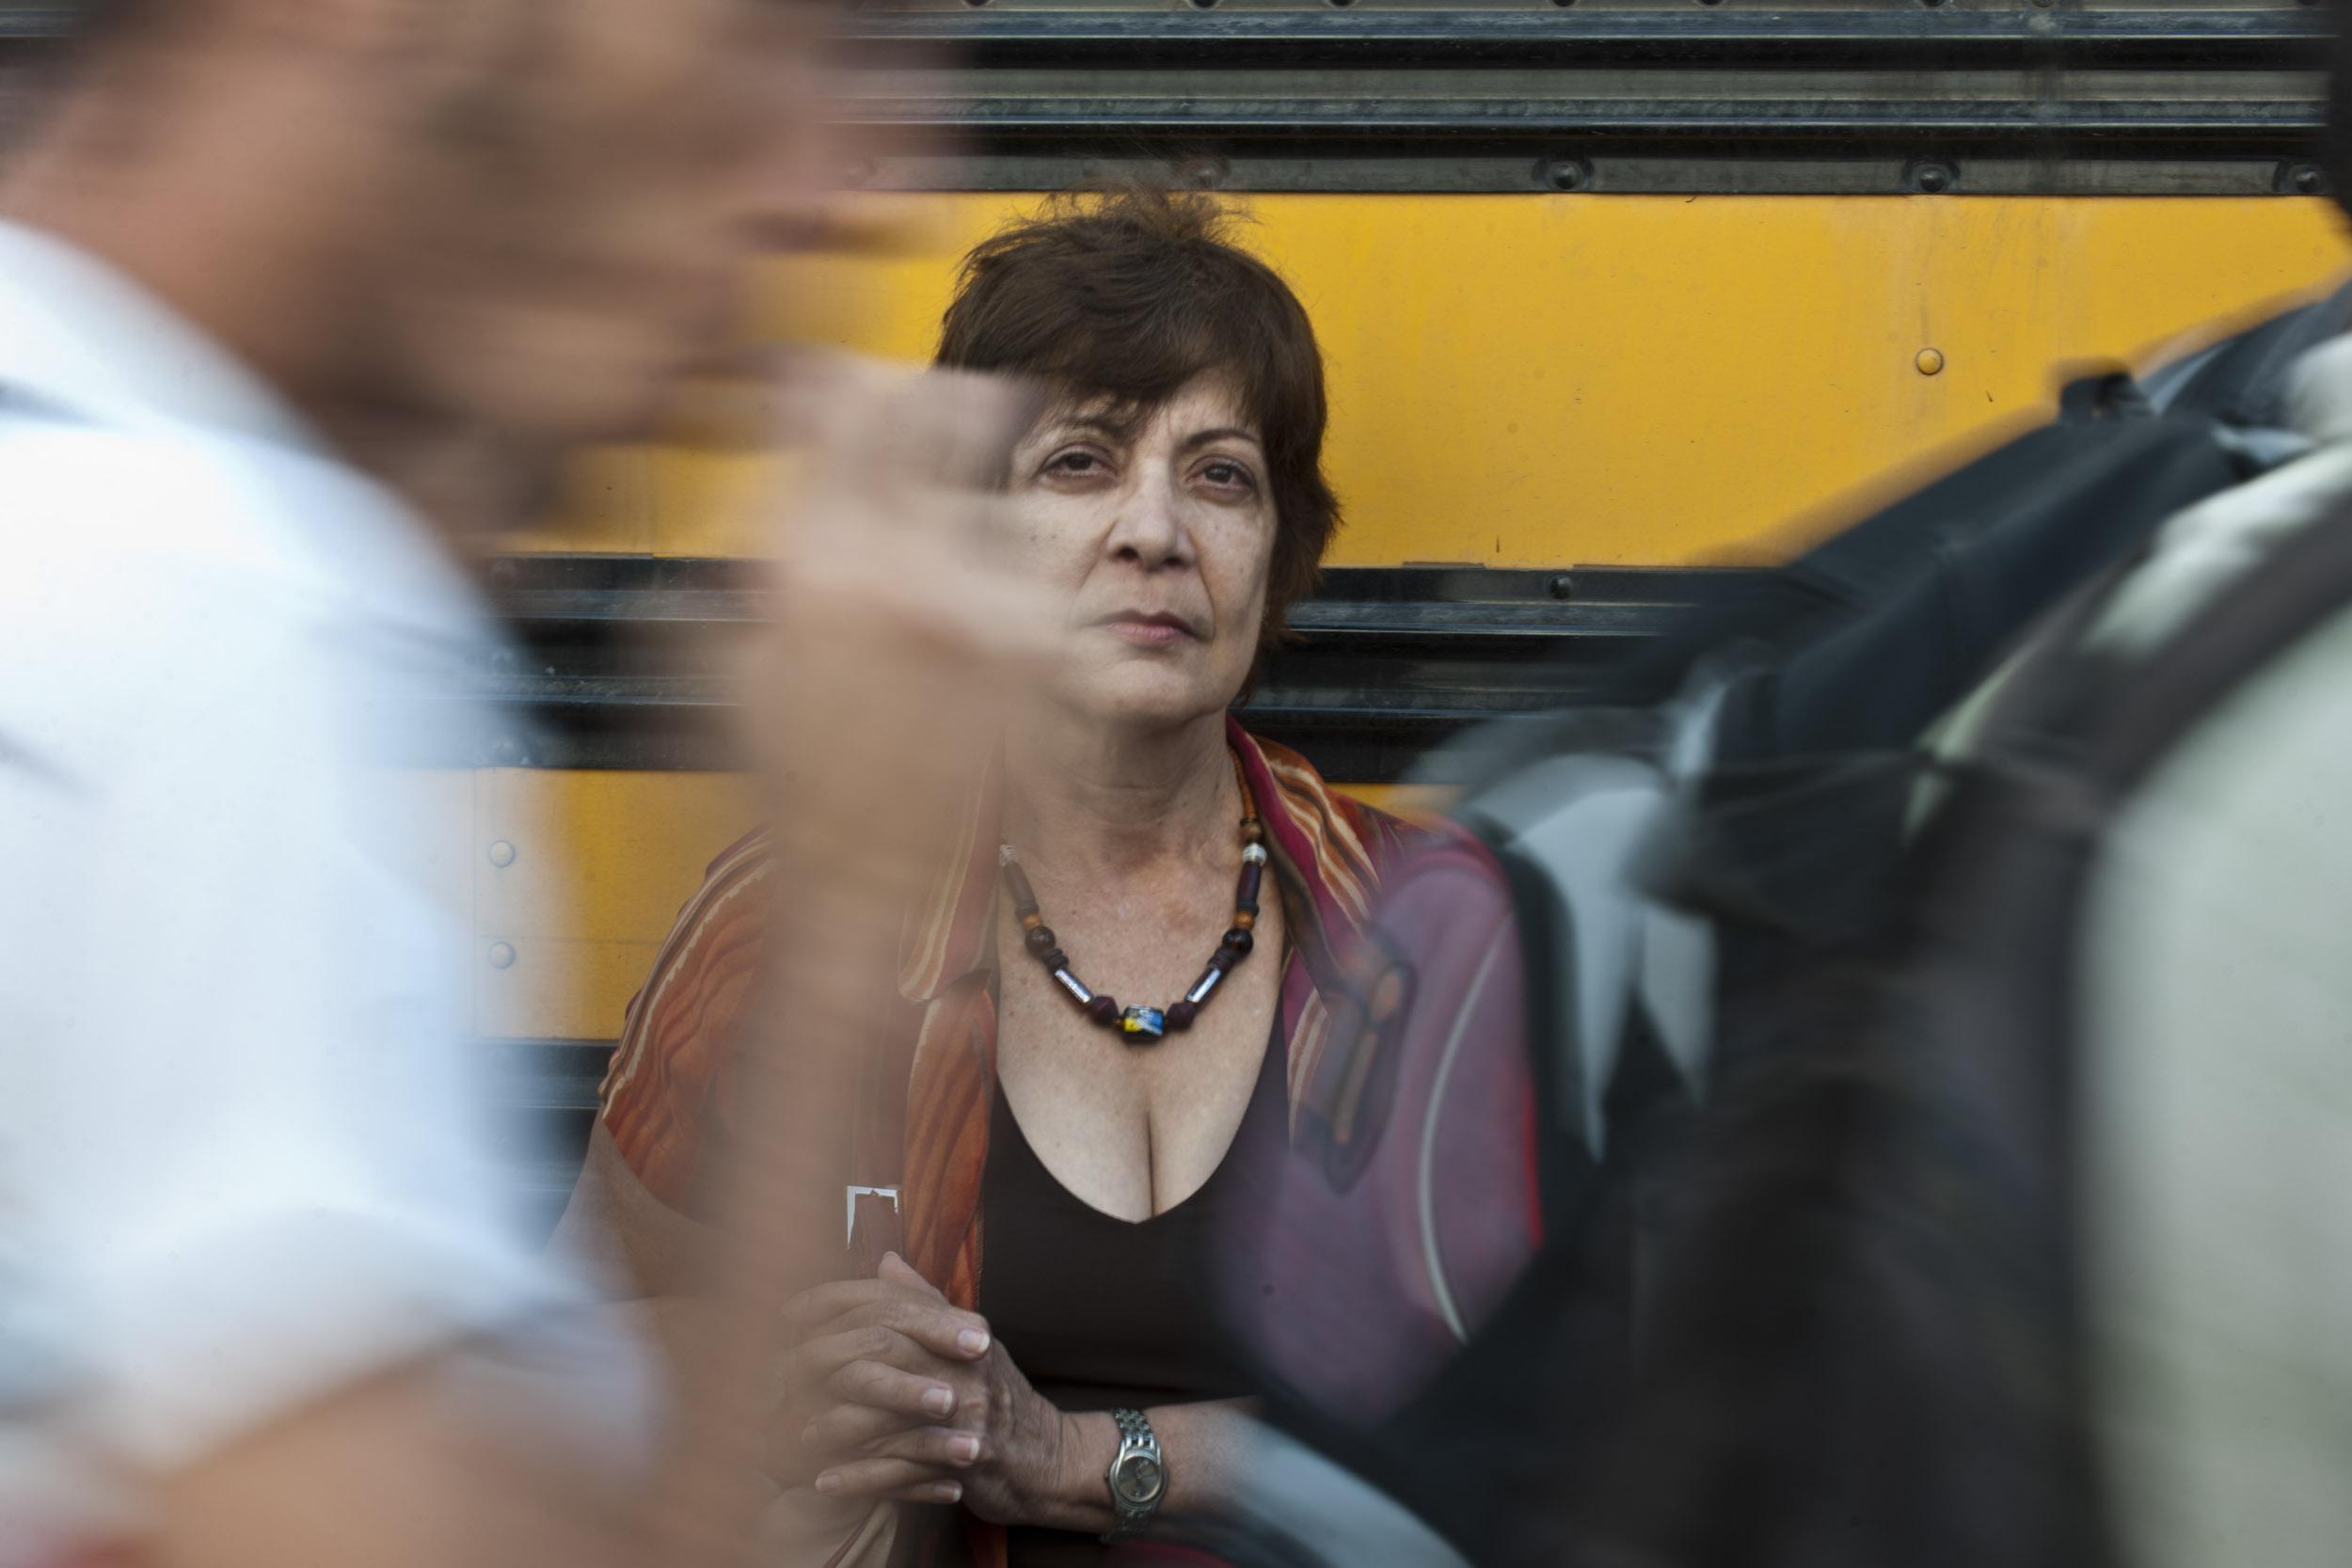 Lourdes Prieto, filmmaker - Illuminated Cuba - Hector Garrido, Aerial and human photography